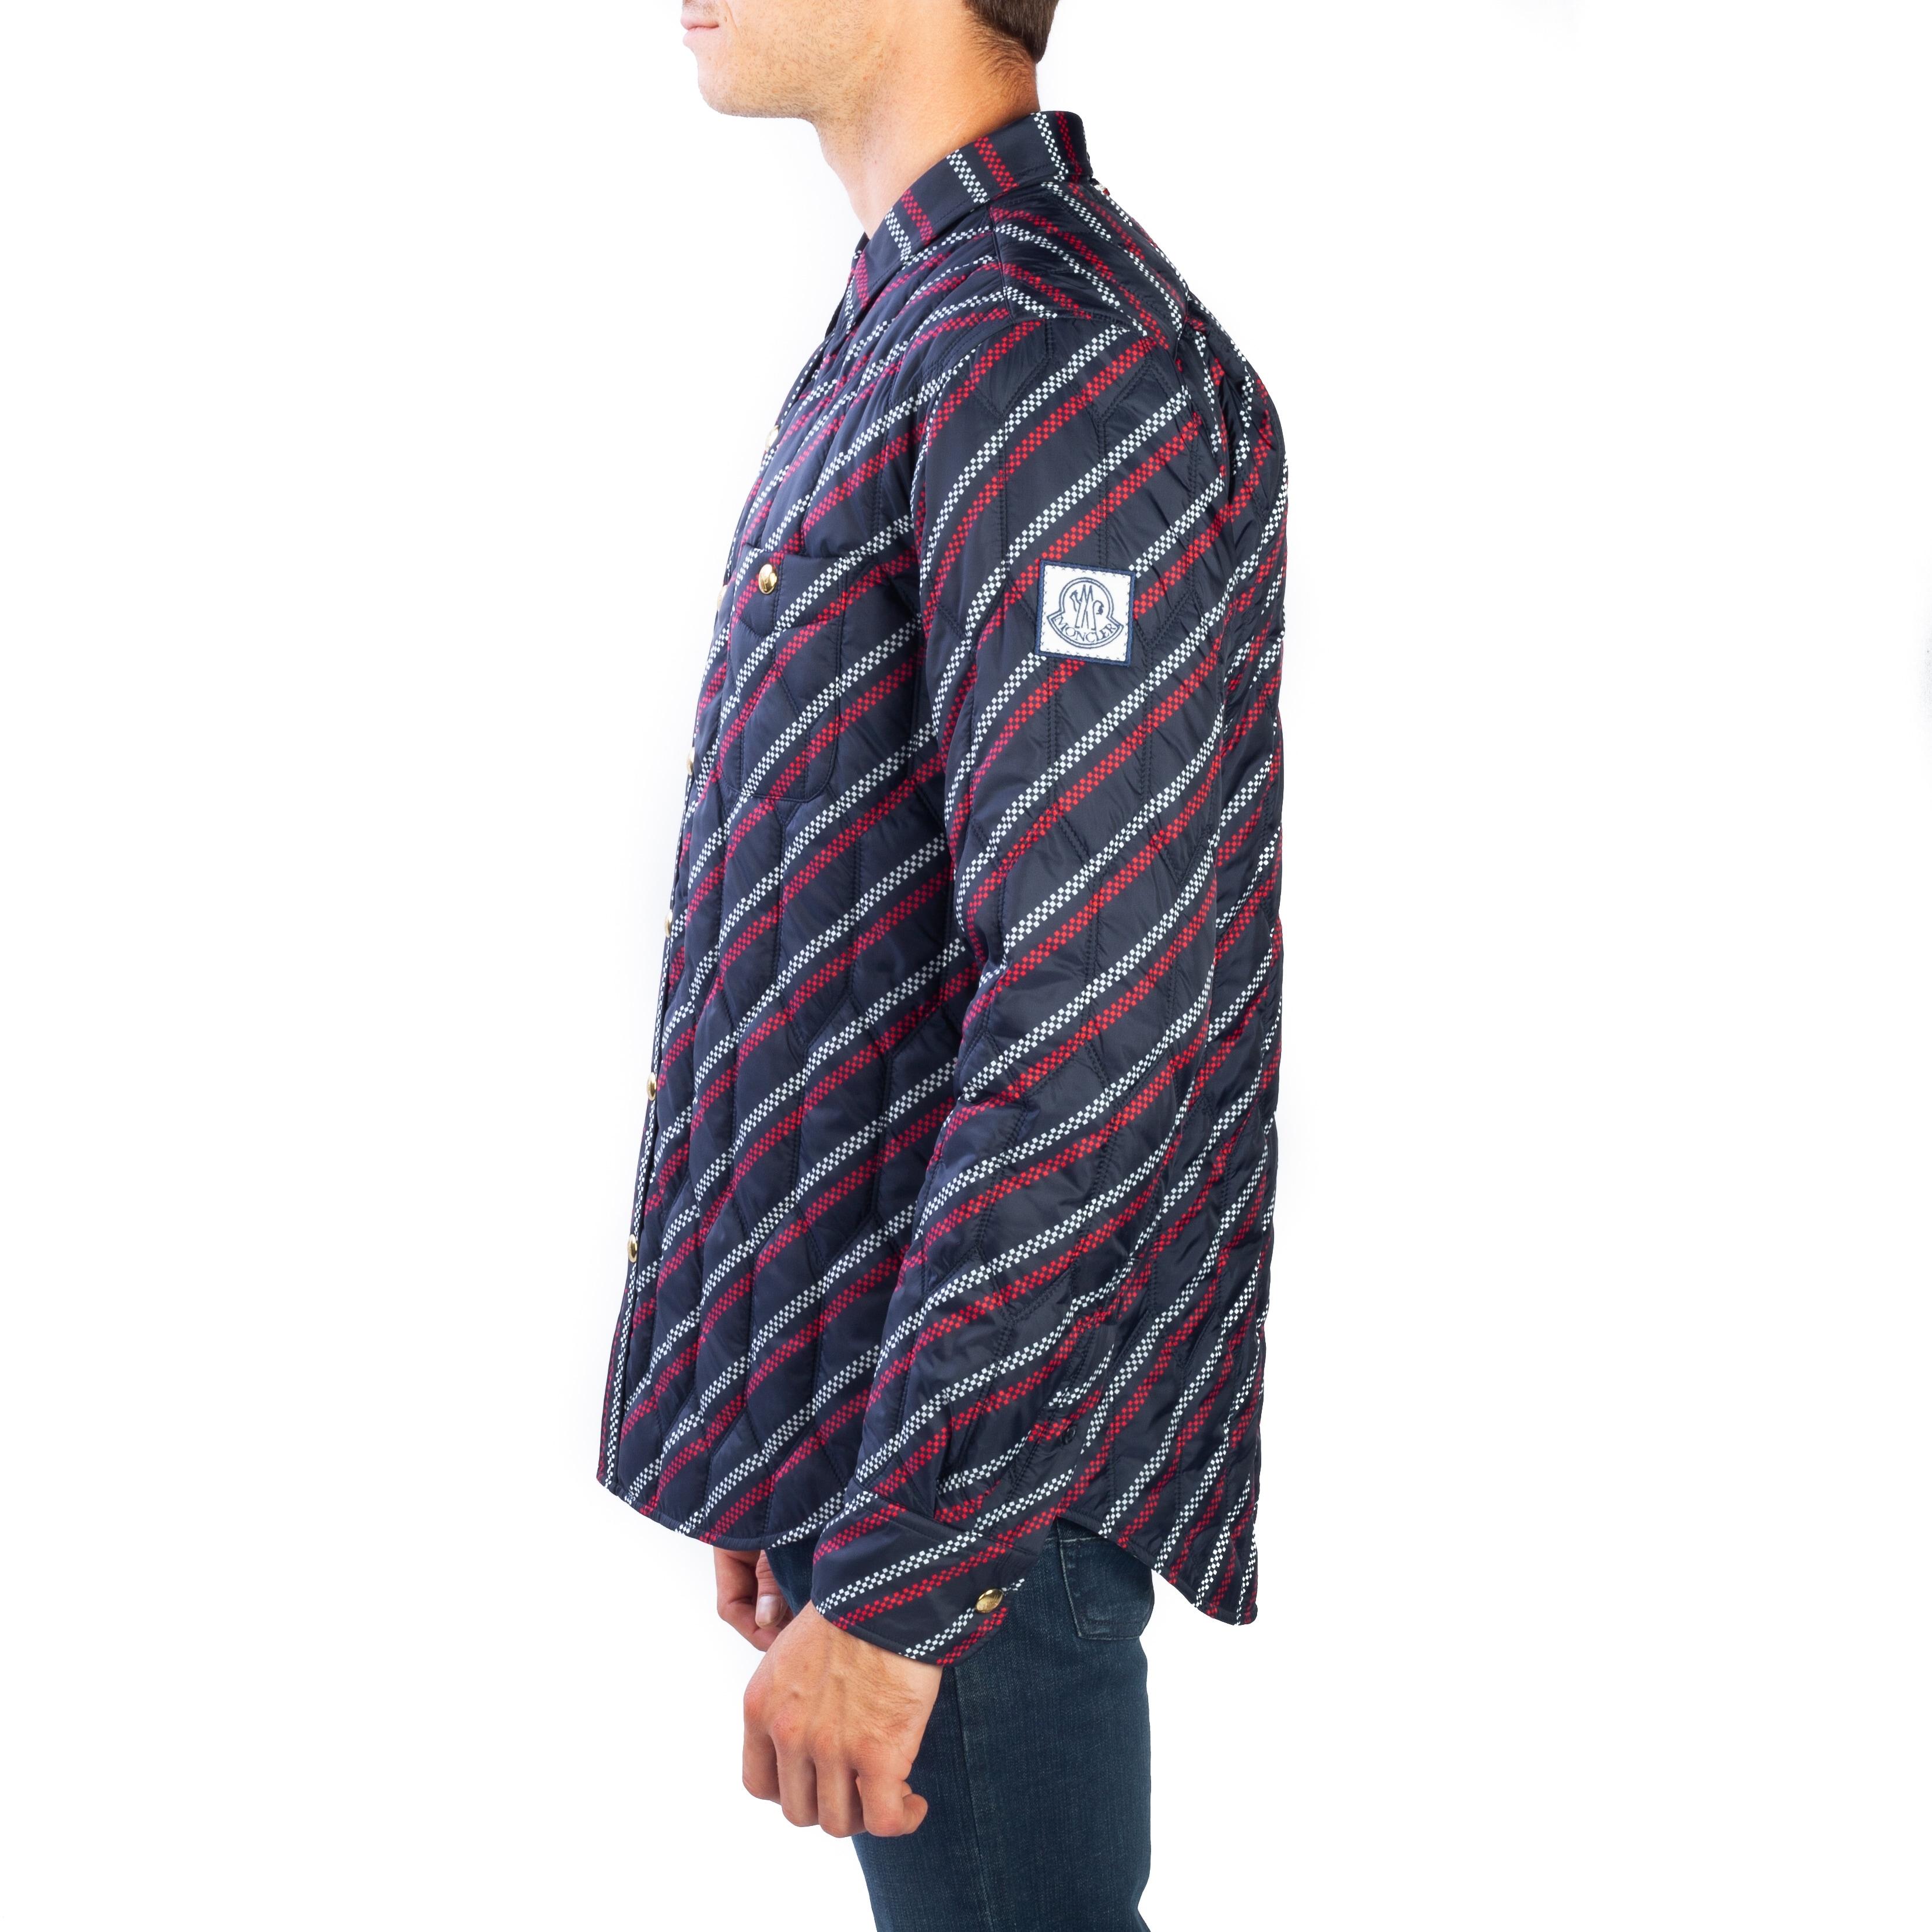 ded97470c5ab Shop Moncler Men s Polyester Checkered Stripe Down Jacket Navy Blue ...